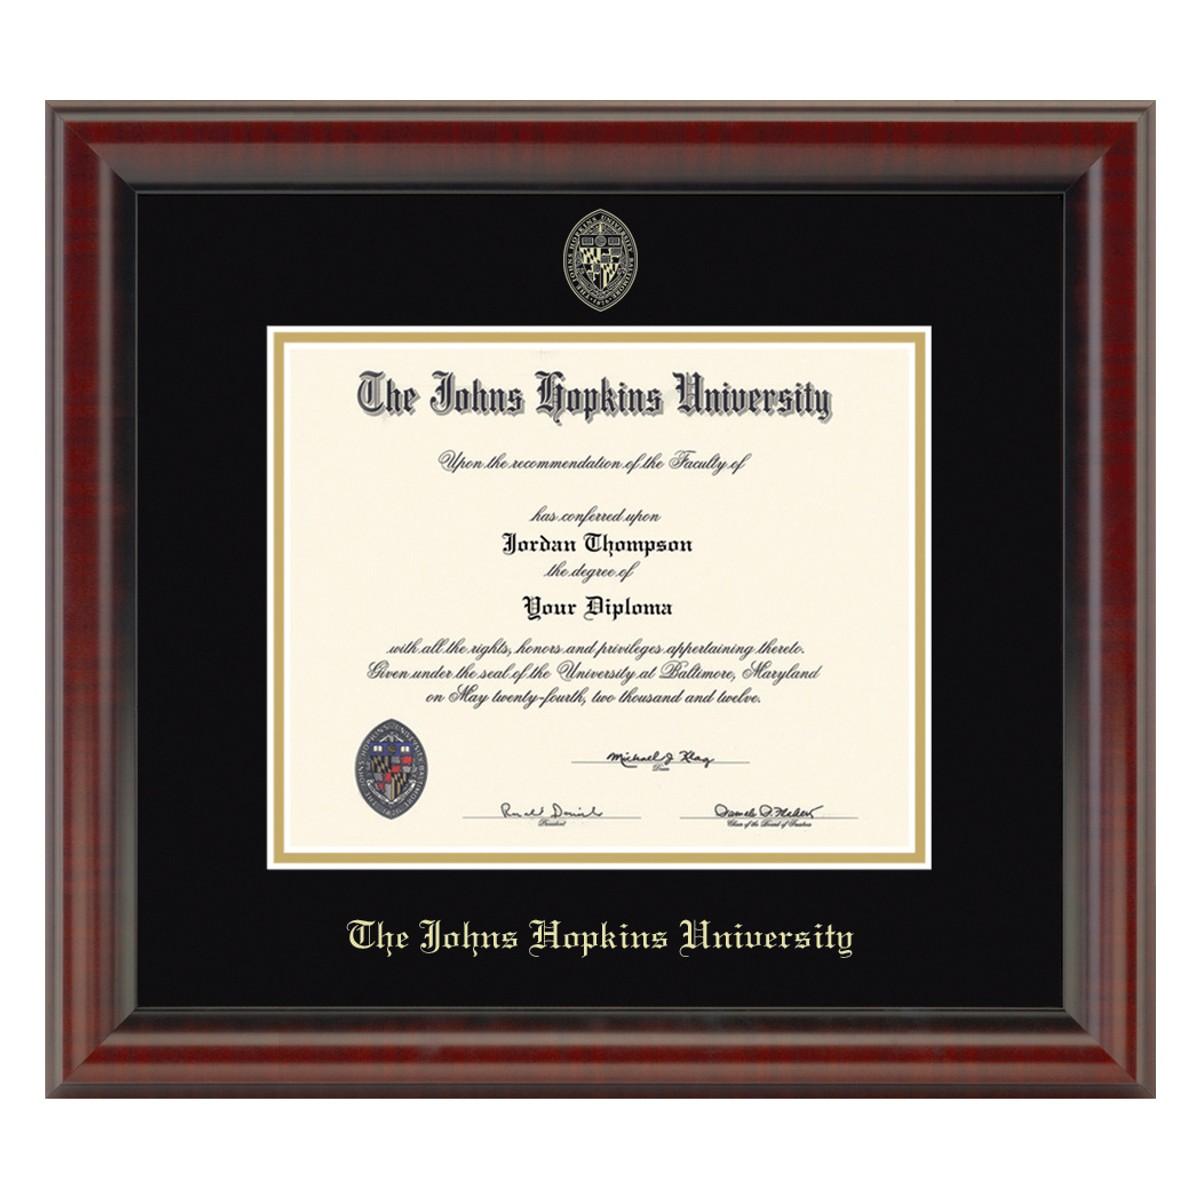 Johns Hopkins Fidelitas Diploma Frame At M Lahart Amp Co